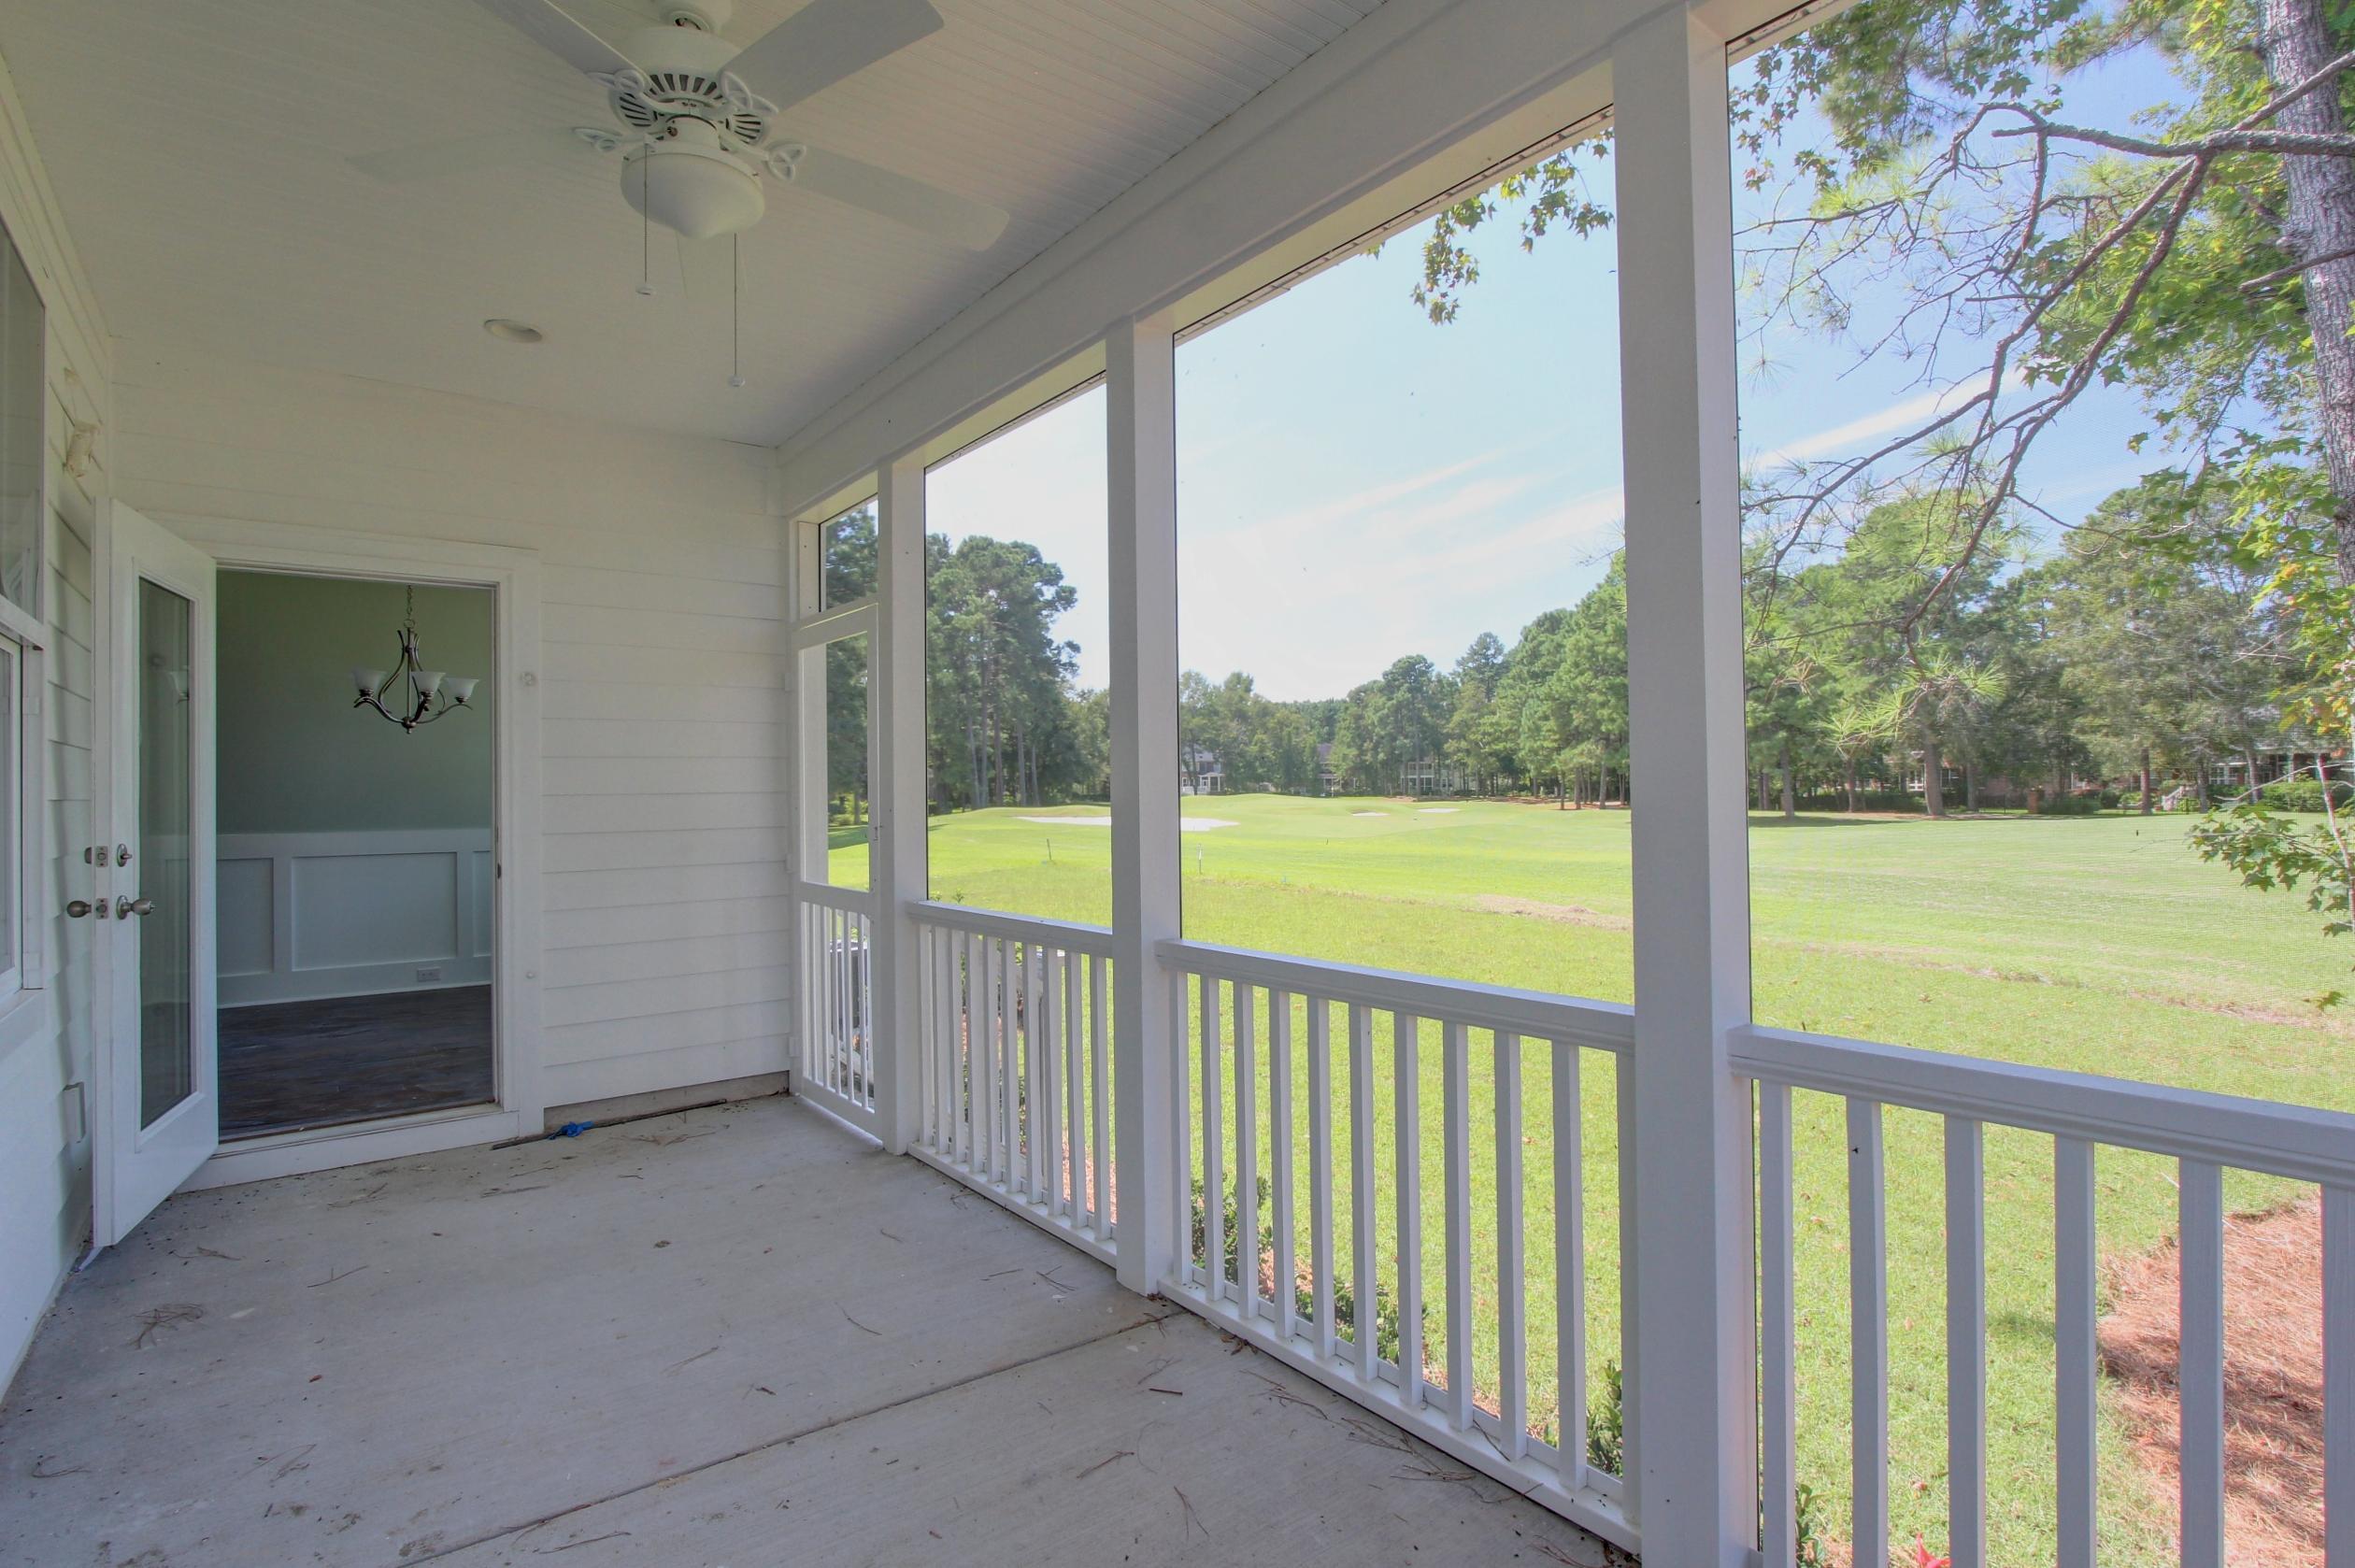 Photo of 8831 E Fairway Woods Dr, North Charleston, SC 29420